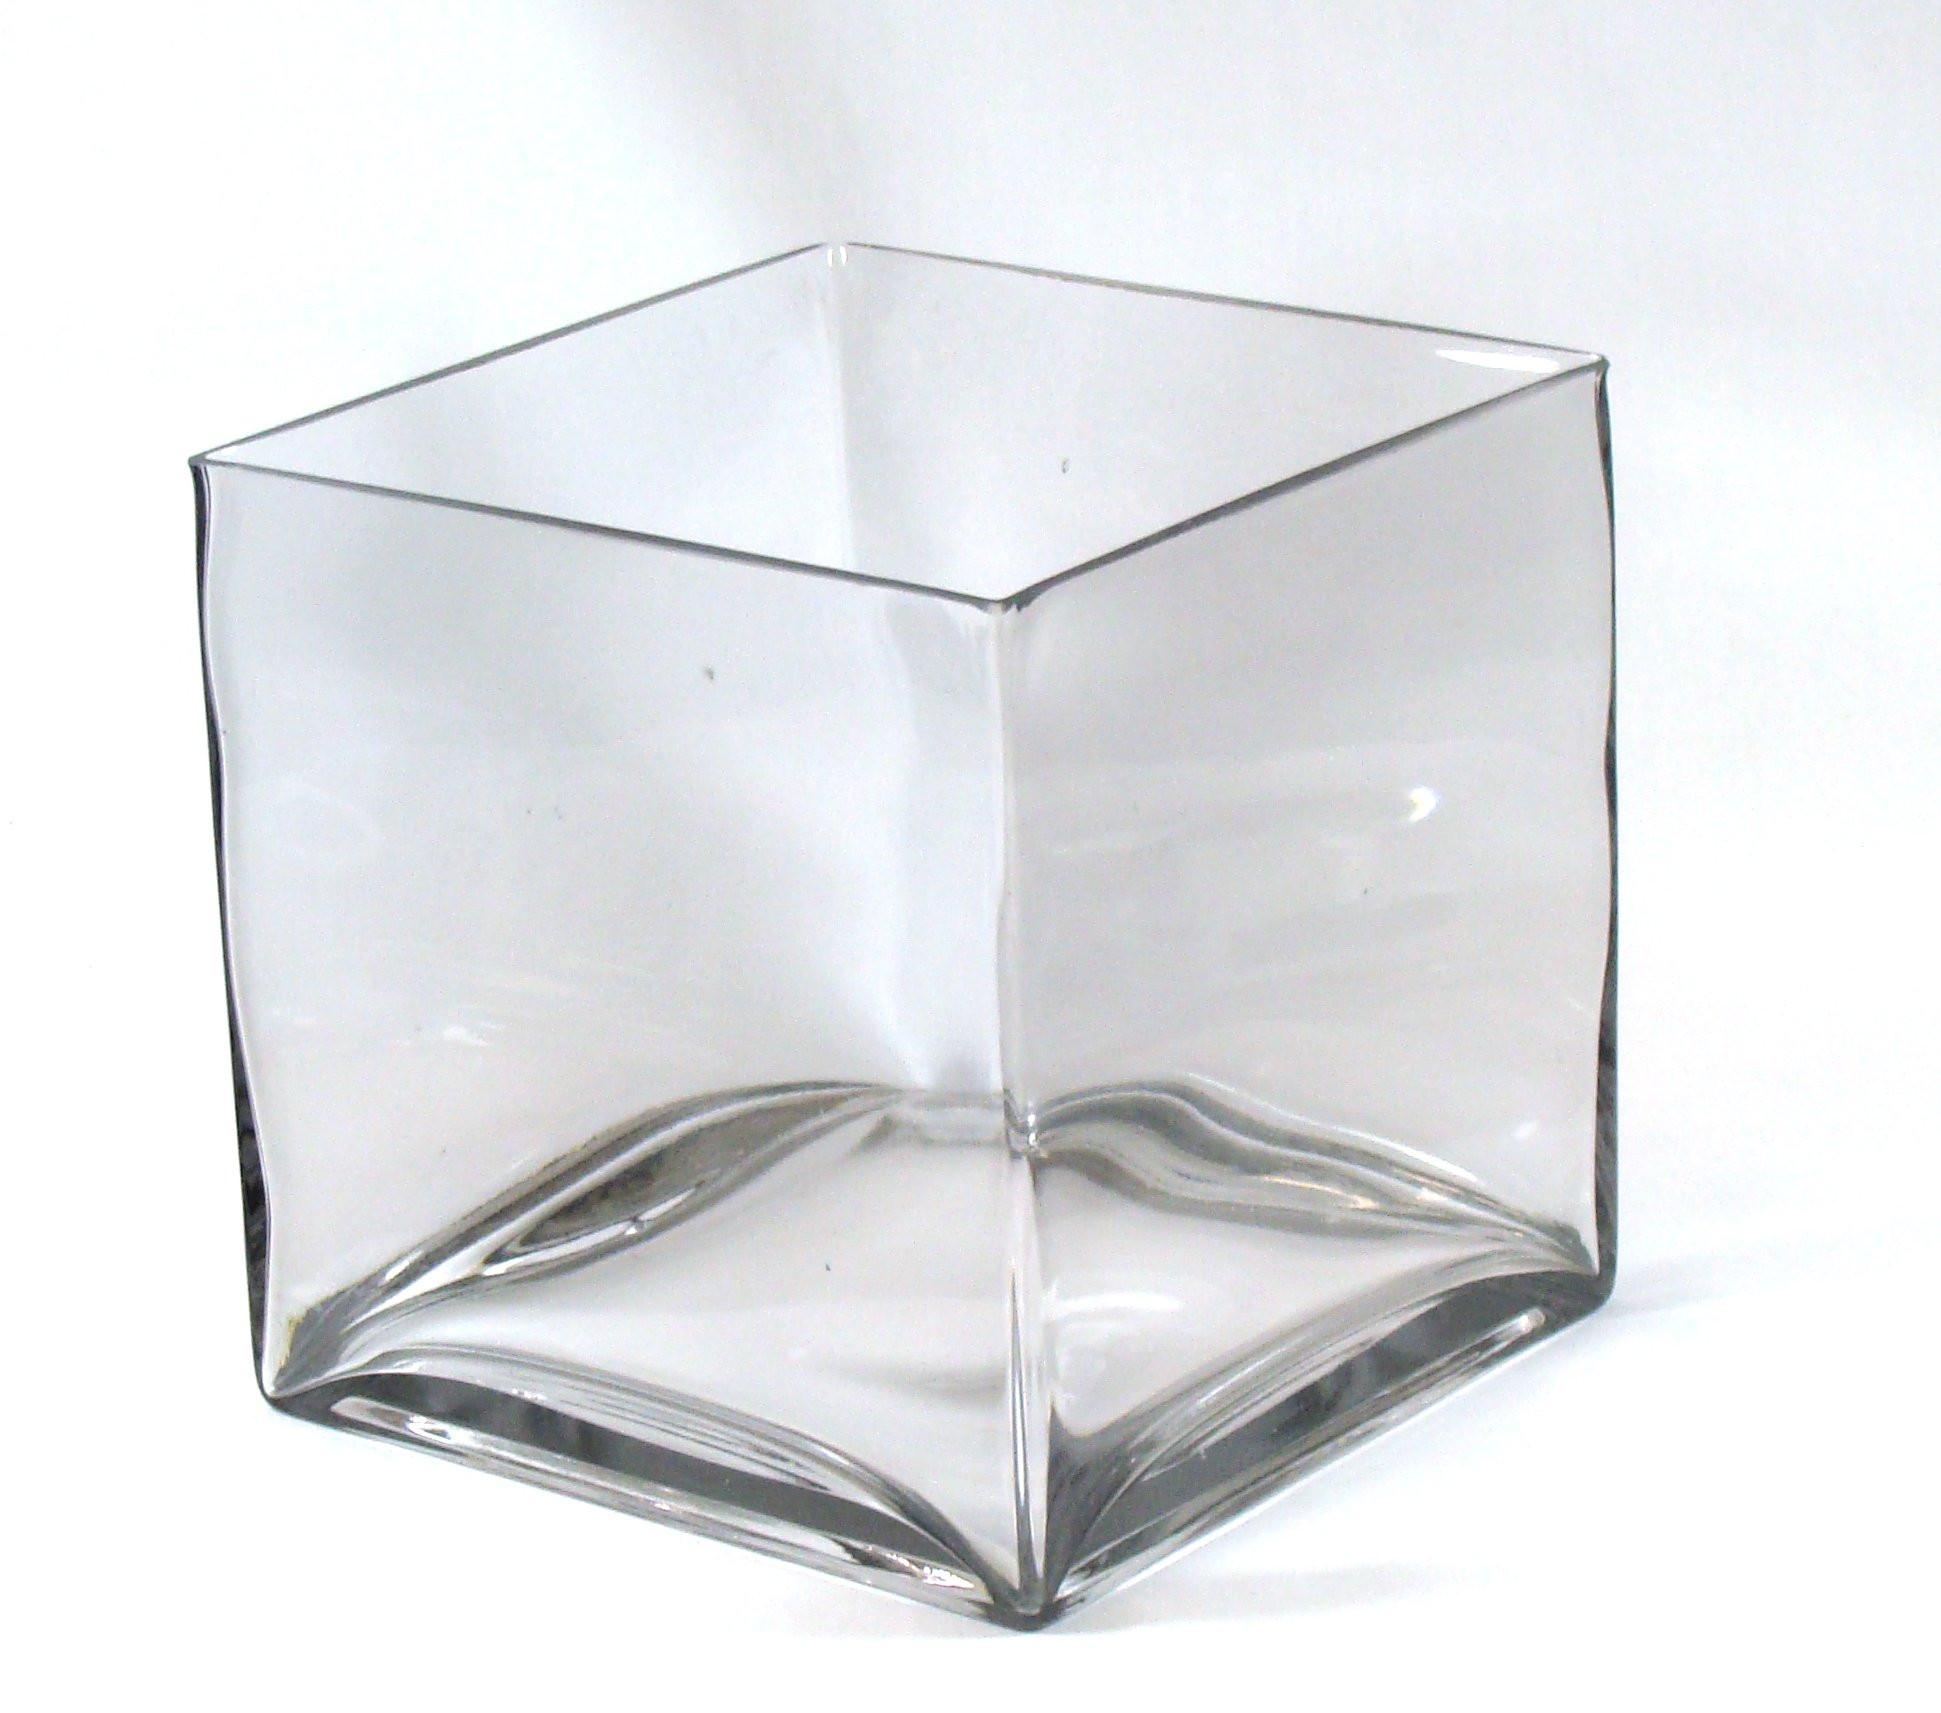 19 Best 5 Inch Square Glass Vases 2021 free download 5 inch square glass vases of buy 8 inch round large glass vase 8 clear cylinder oversize inside 8 square large glass vase 8 inch clear cube oversize centerpiece 8x8x8 candleholder